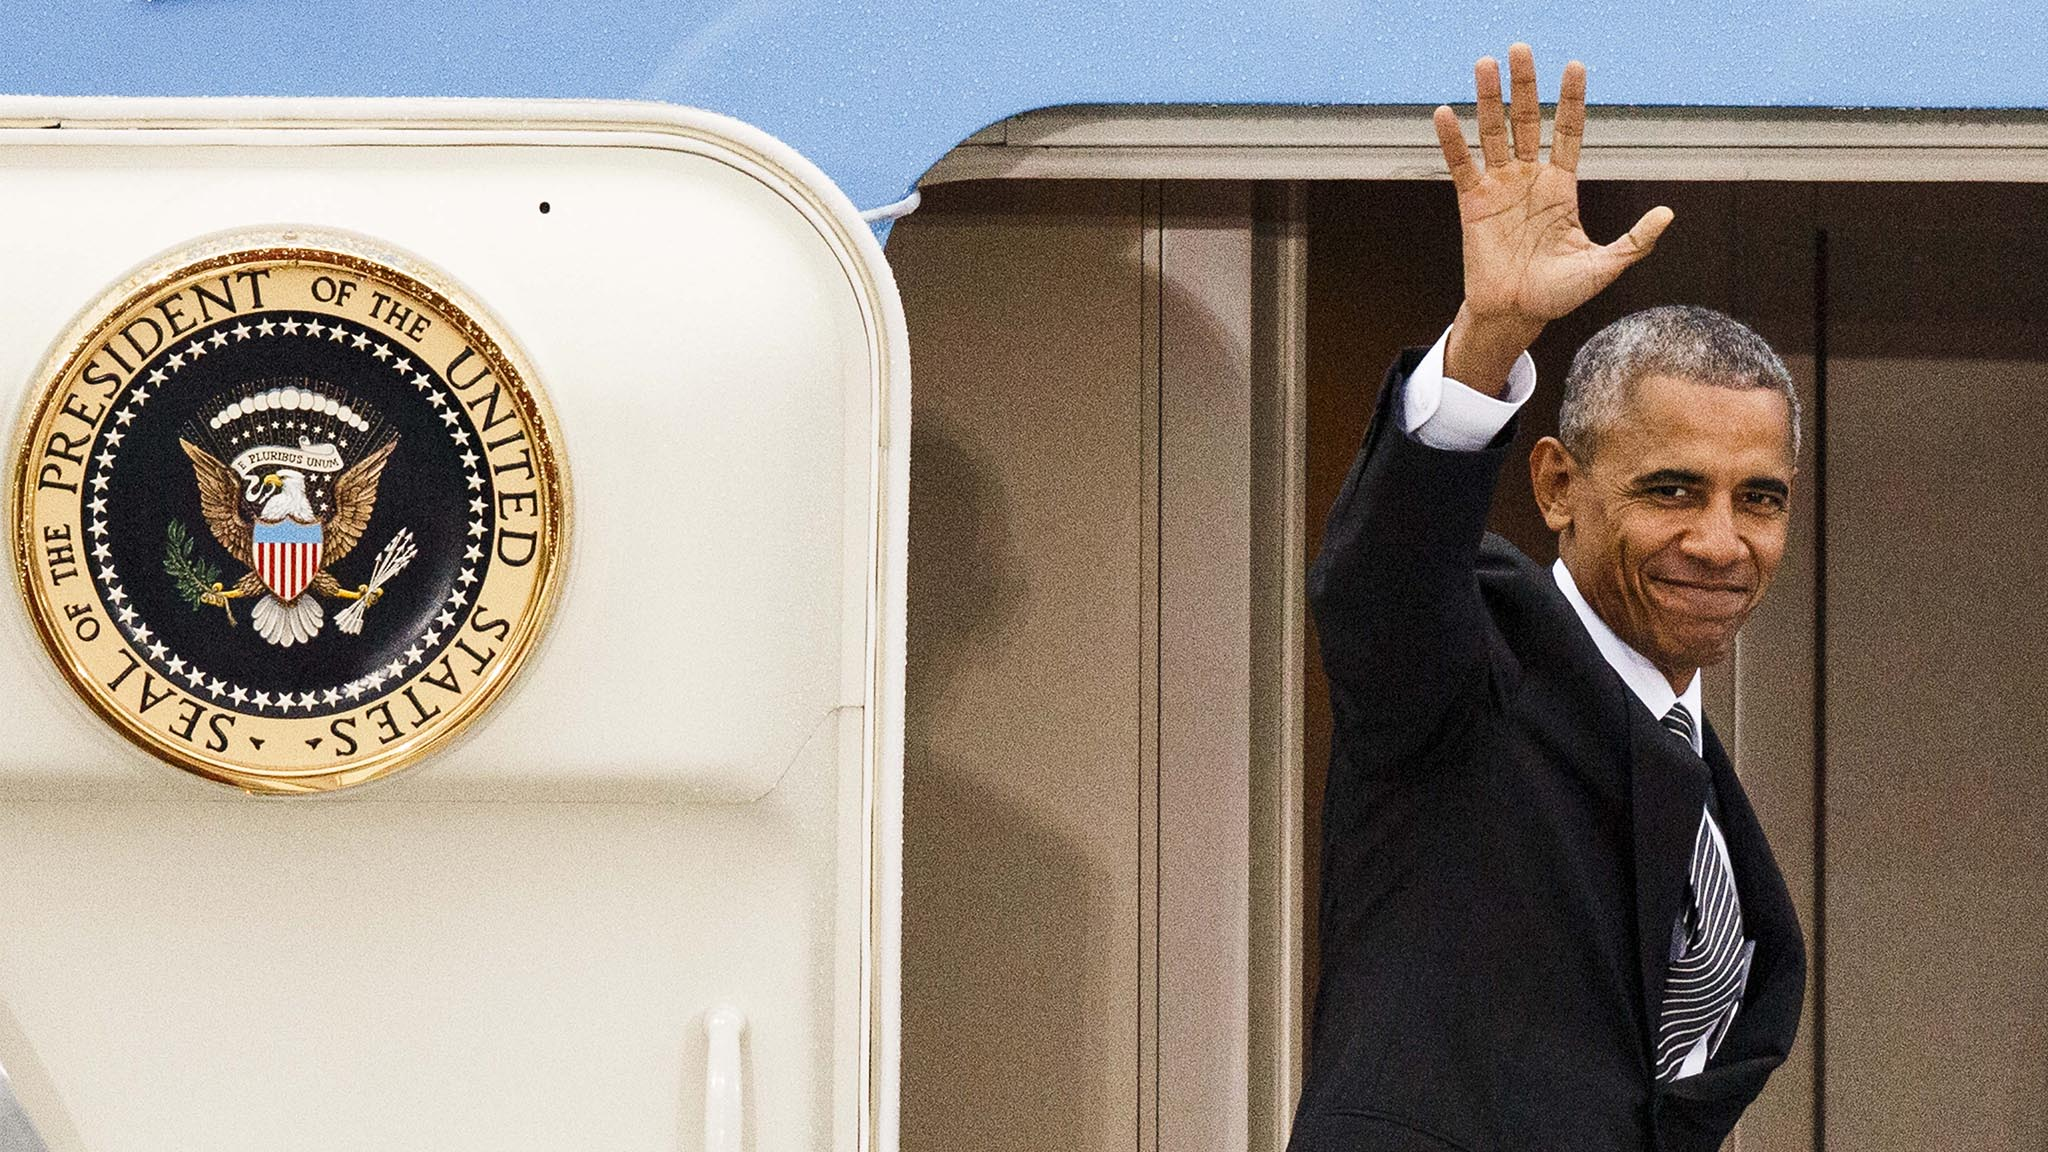 President Obama Departs After Meeting European Leaders